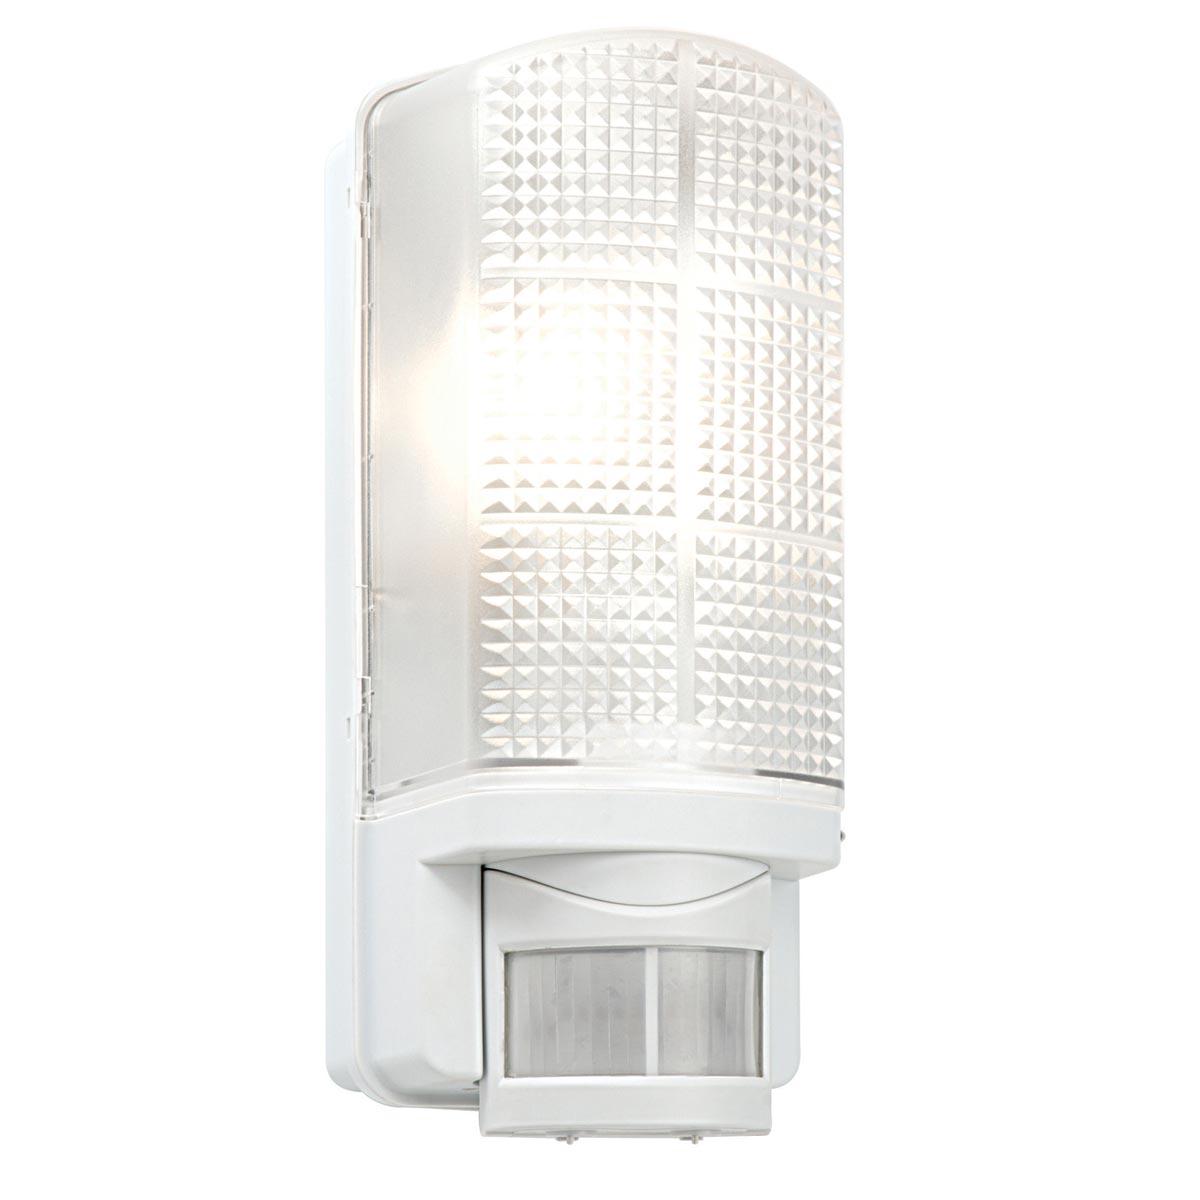 motion rust proof outdoor sensor light bulkhead in white 48740. Black Bedroom Furniture Sets. Home Design Ideas